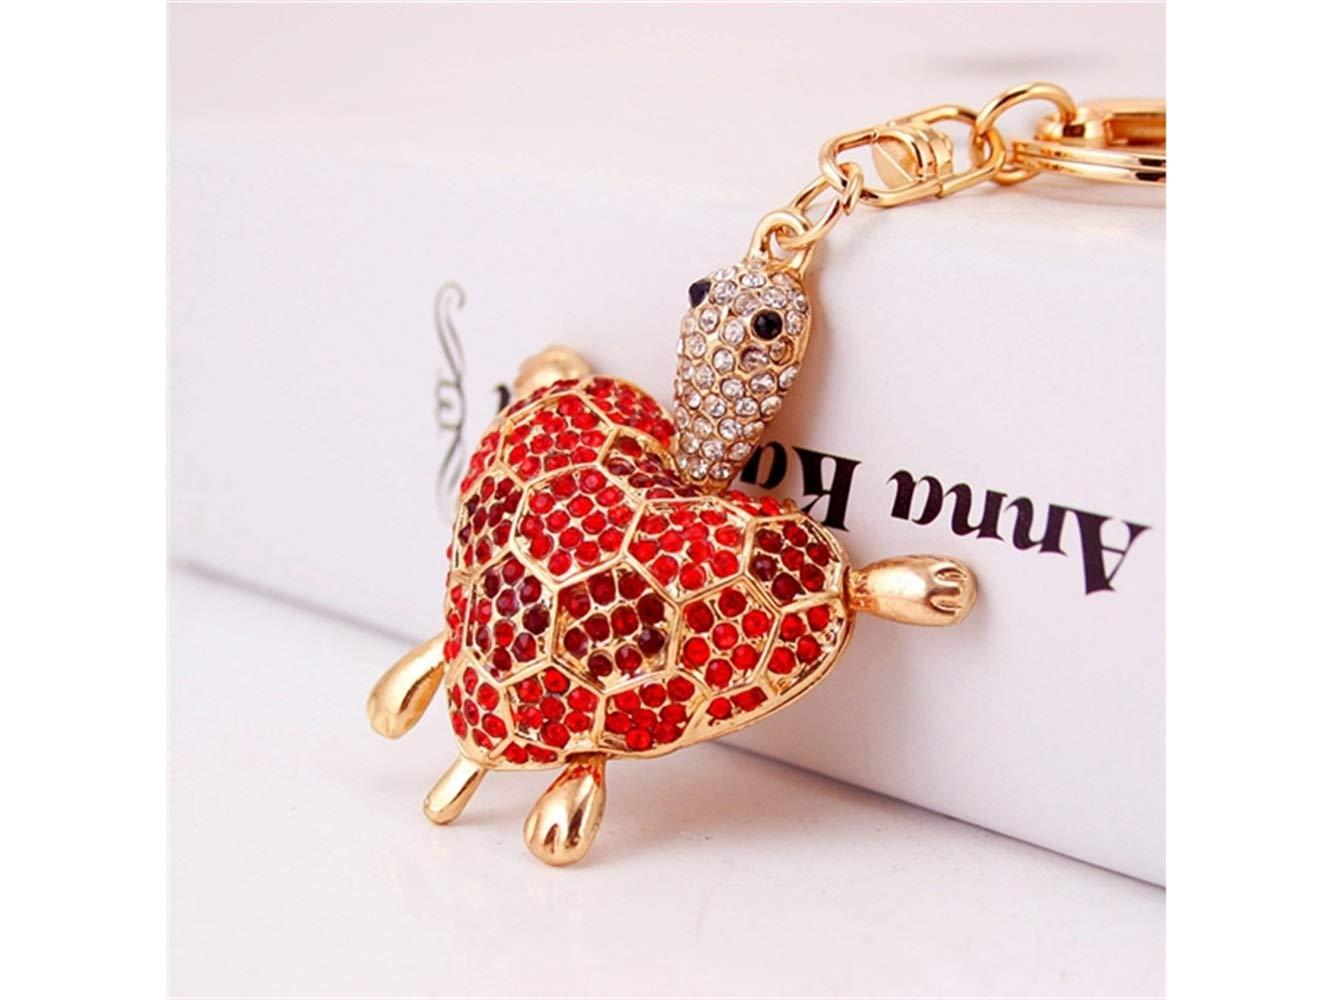 Car Keychain, Cute Diamond Love Back Shell Turtle Keychain Animal Key Trinket Car Bag Key Holder Decorations(Red) for Gift